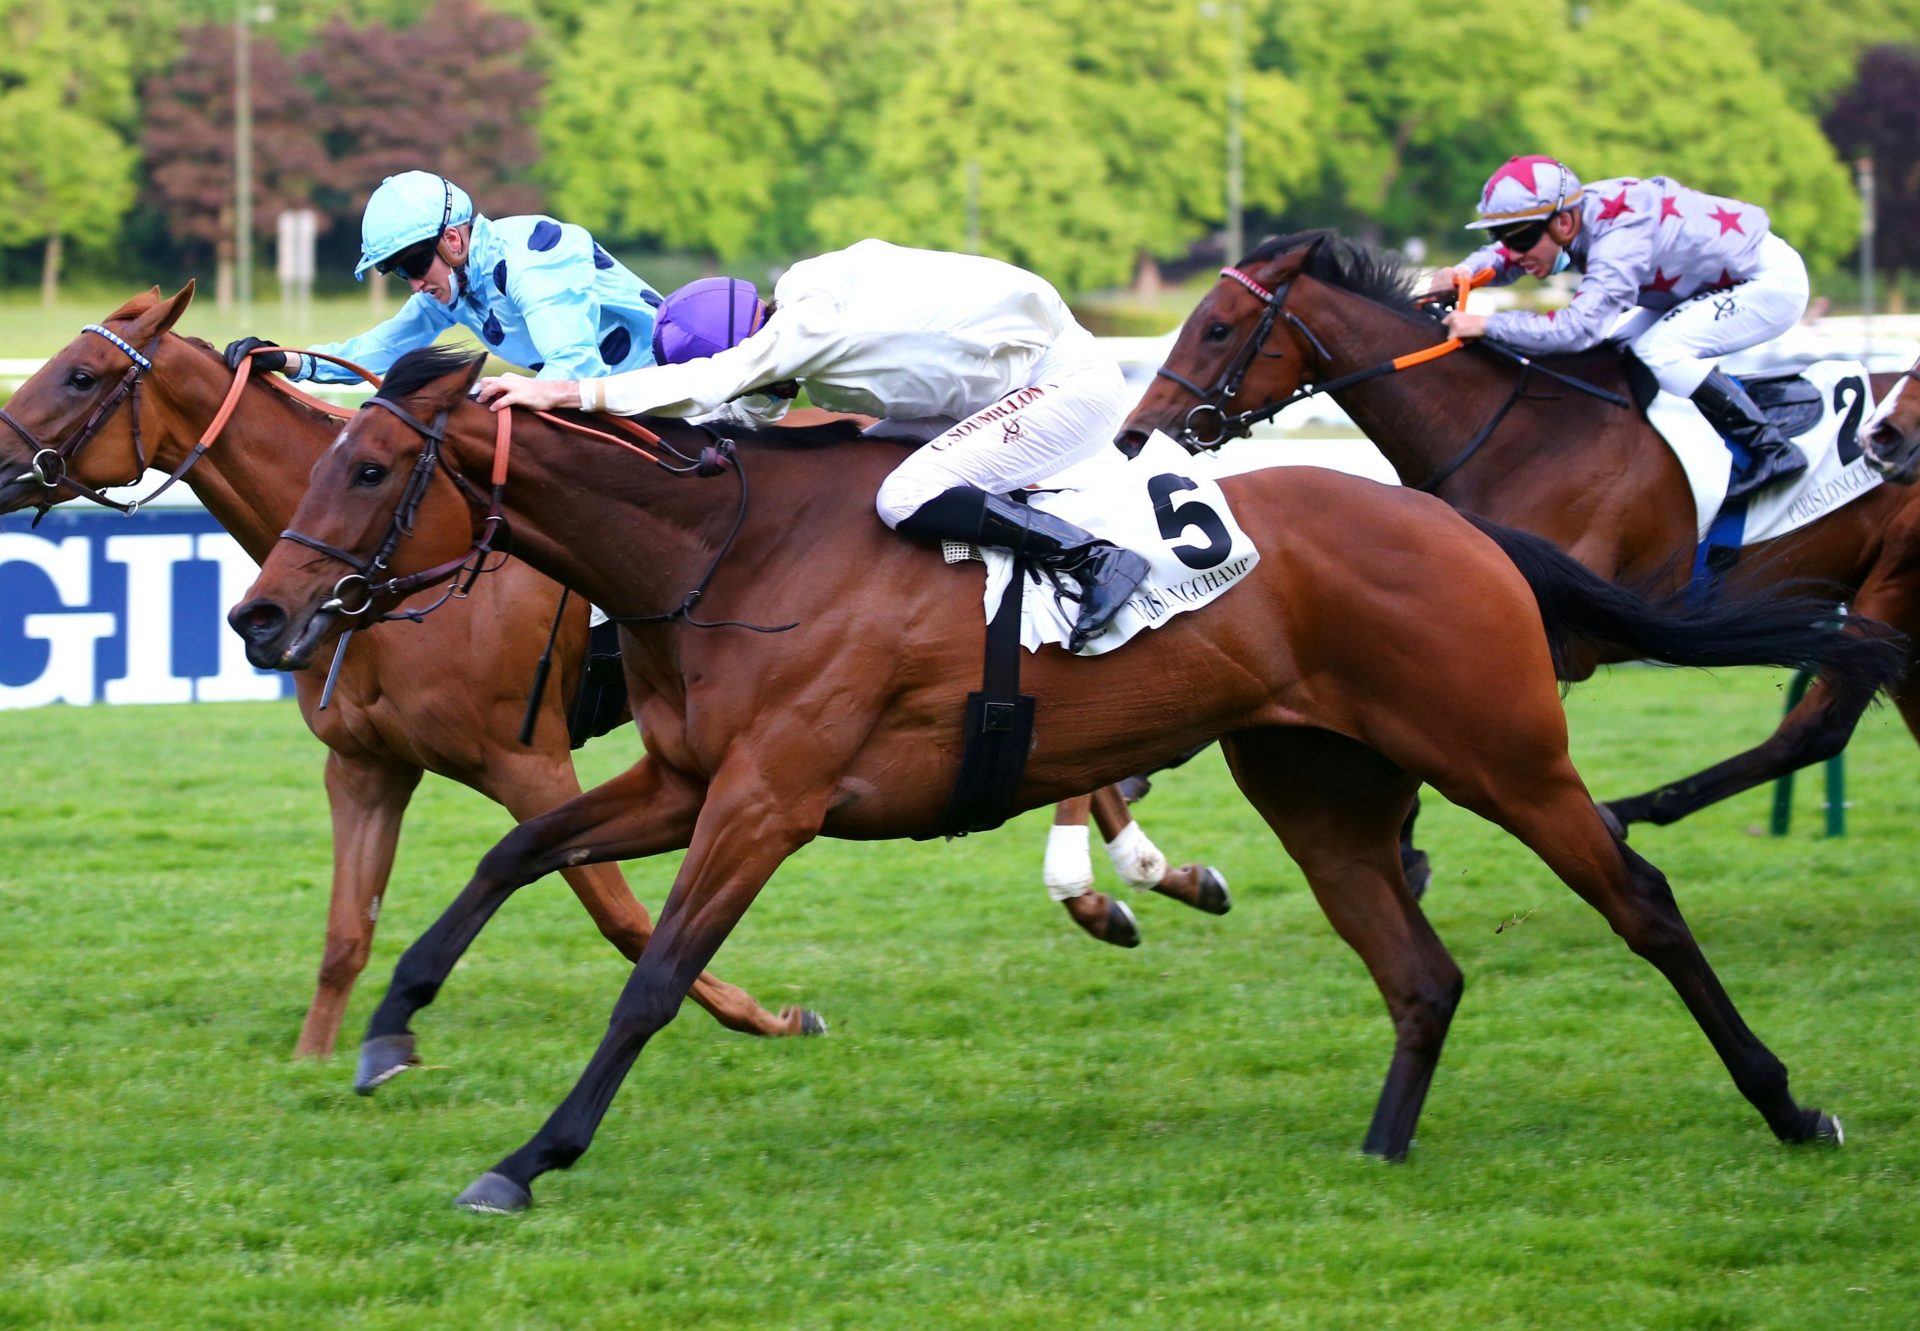 Ranes (Vadamos) Wins The Prix De La Megisserie At Longchamp